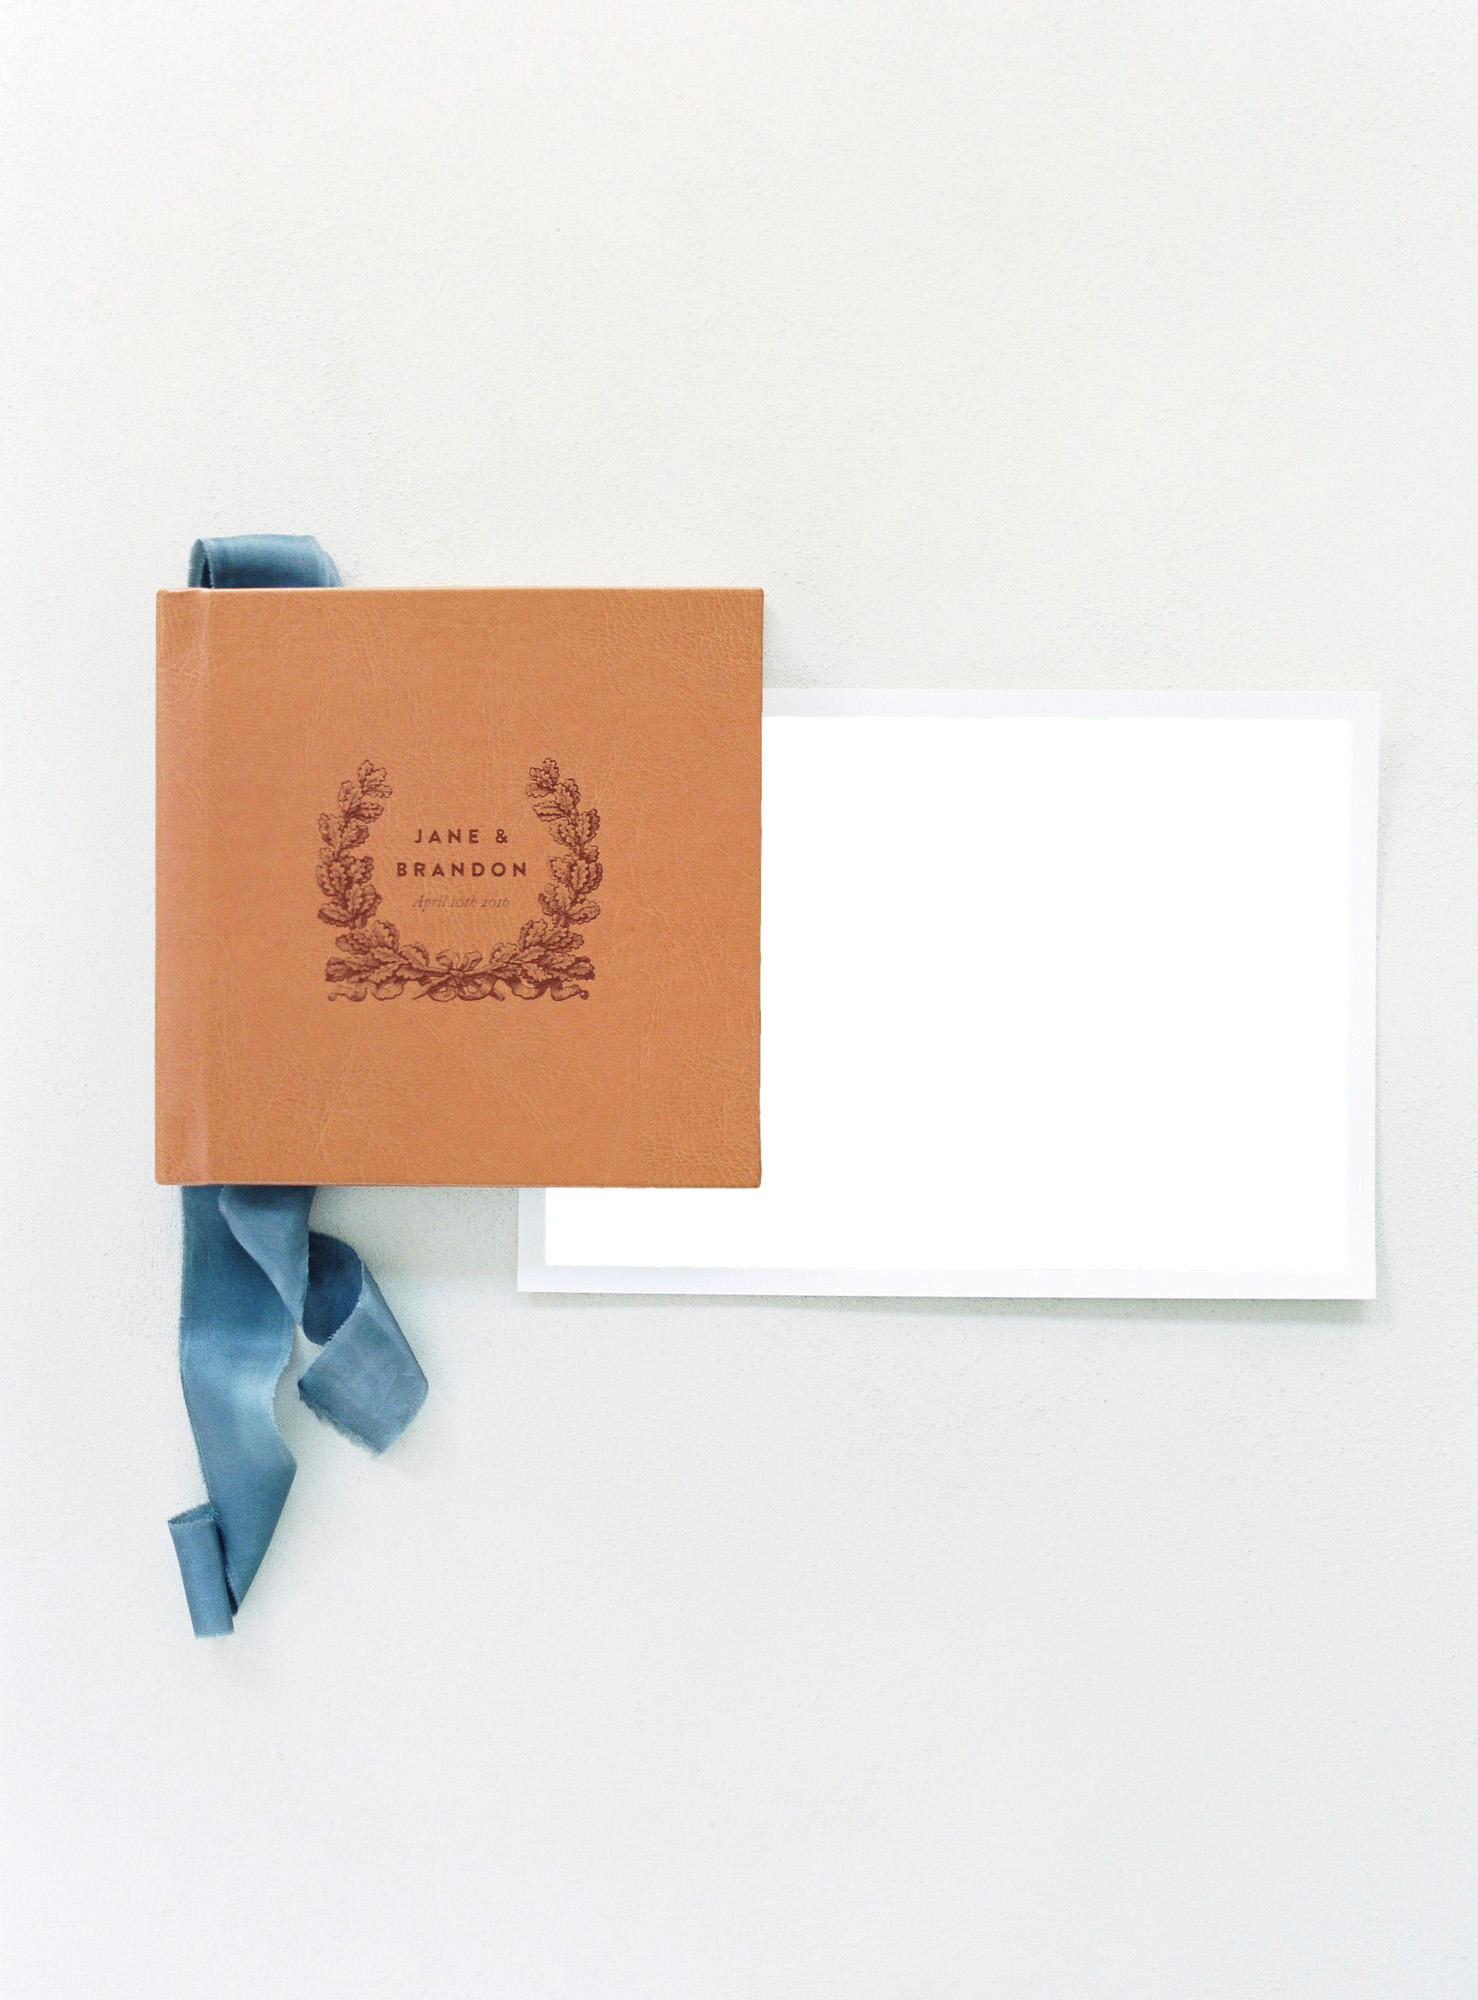 atkins-sample-album-images-4.jpg